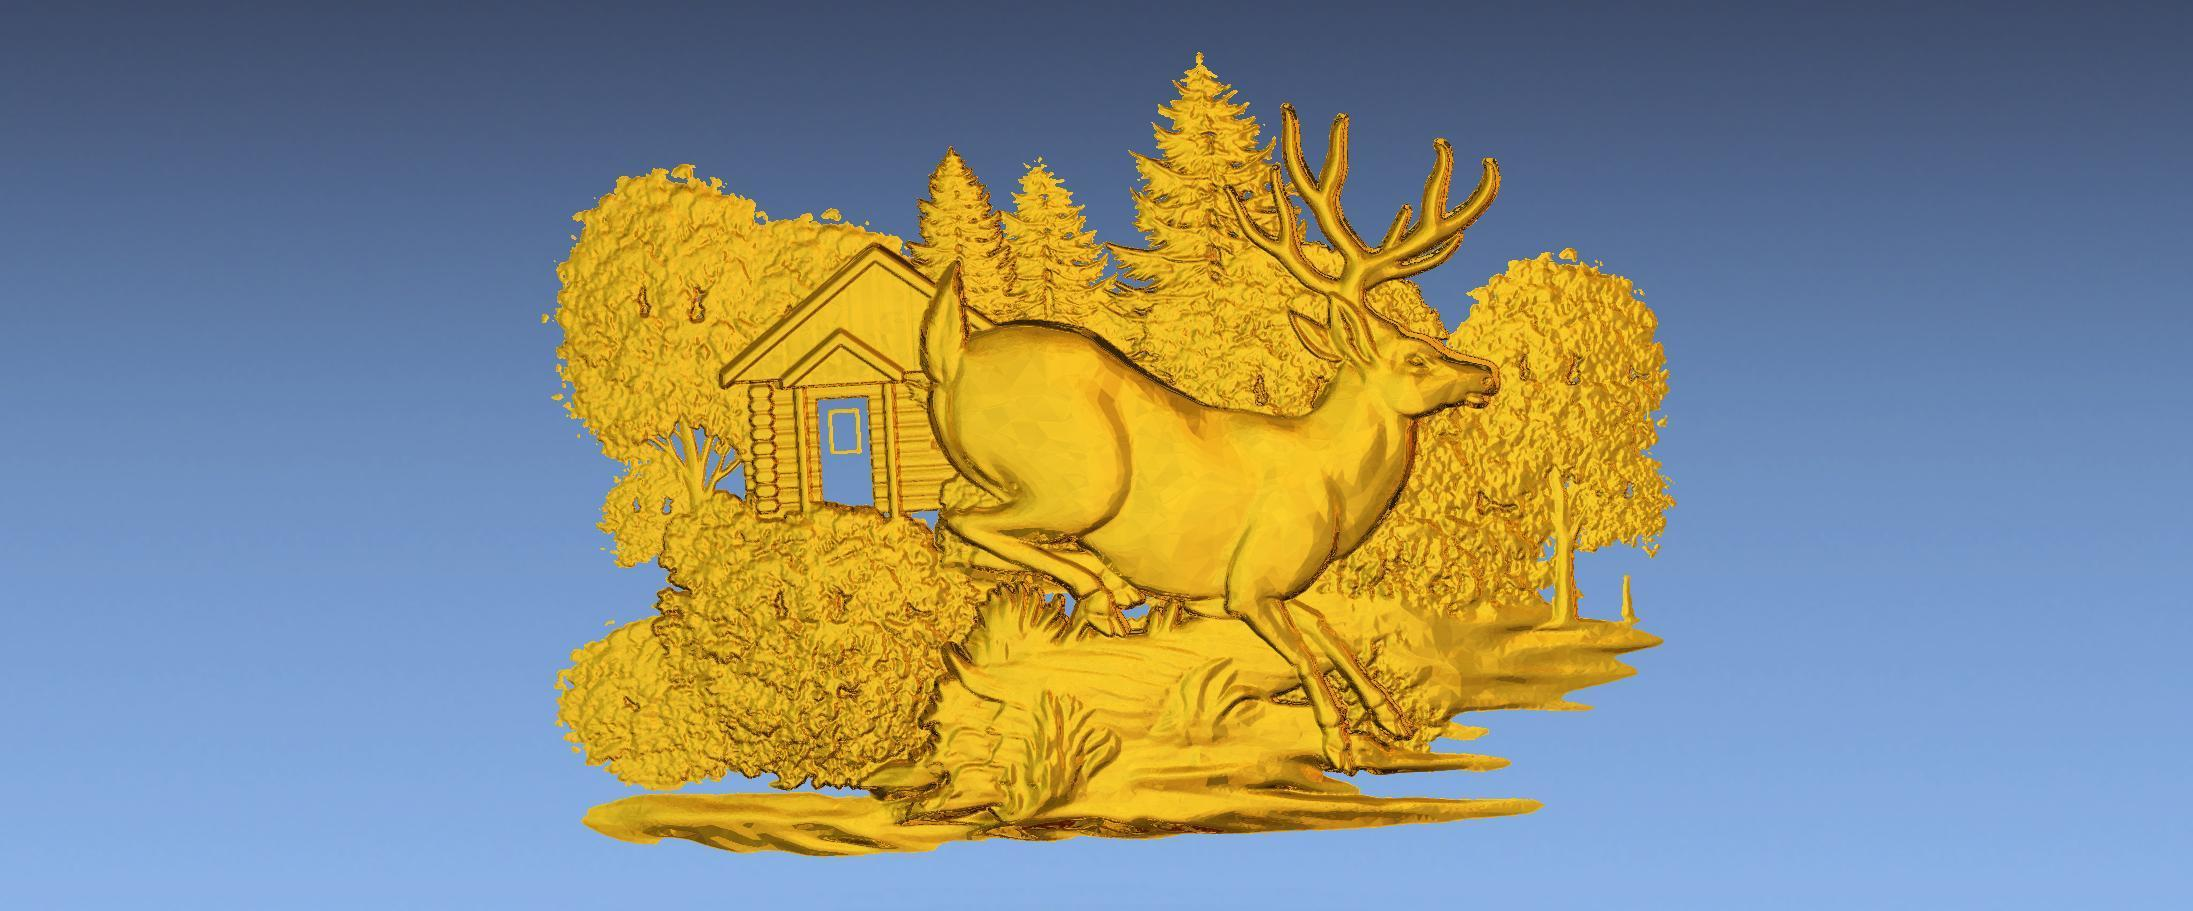 2.jpg Download free STL file 3D STL SCARED DEER • 3D print model, ALPHA_MENA